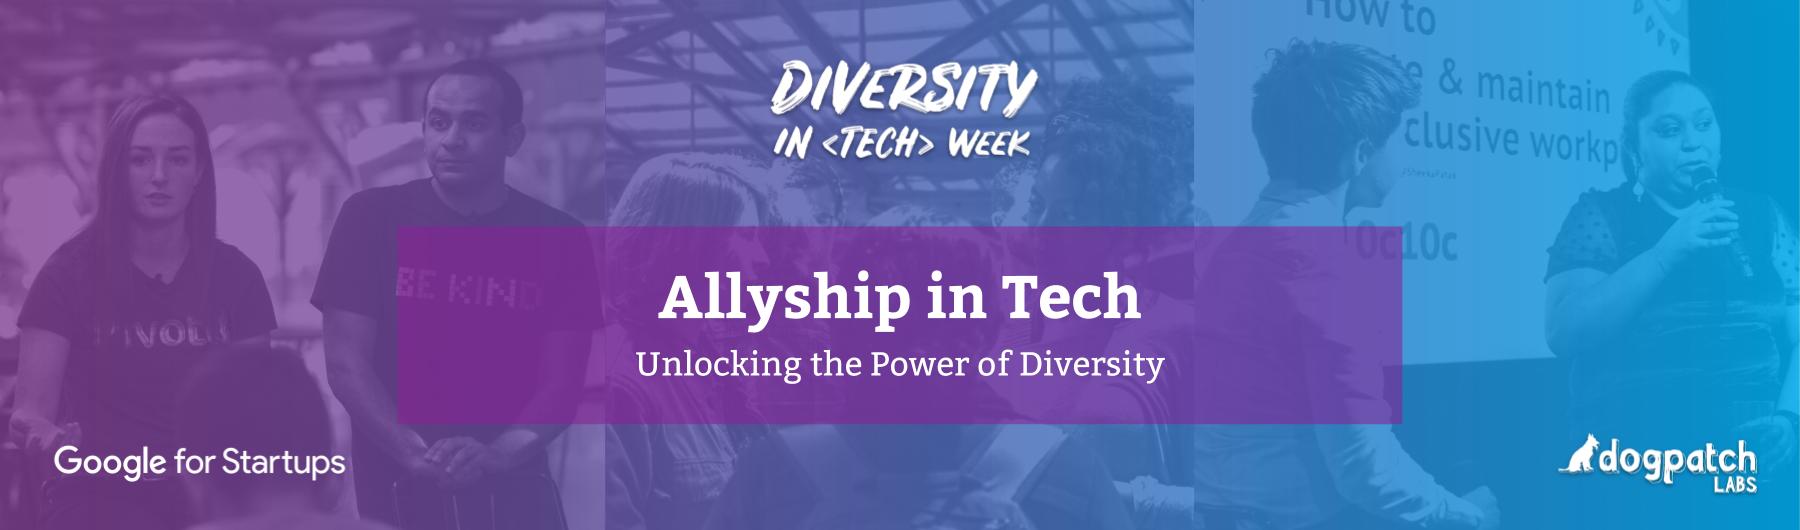 Allyship in Tech - Unlocking the Power of Diversity